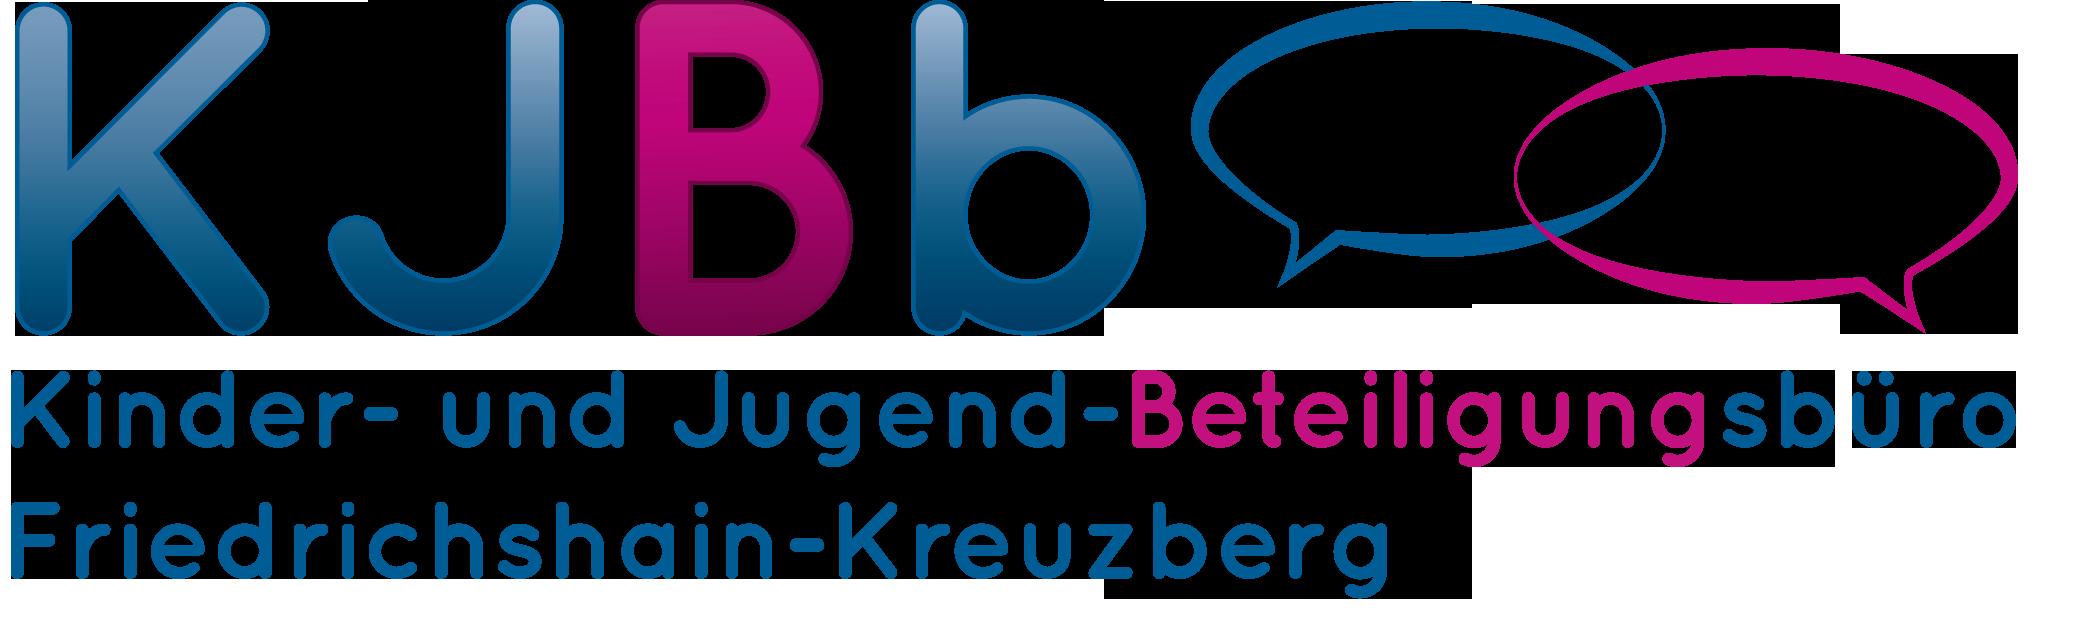 Logo_KJBb_web_transparenter_Hintergrund